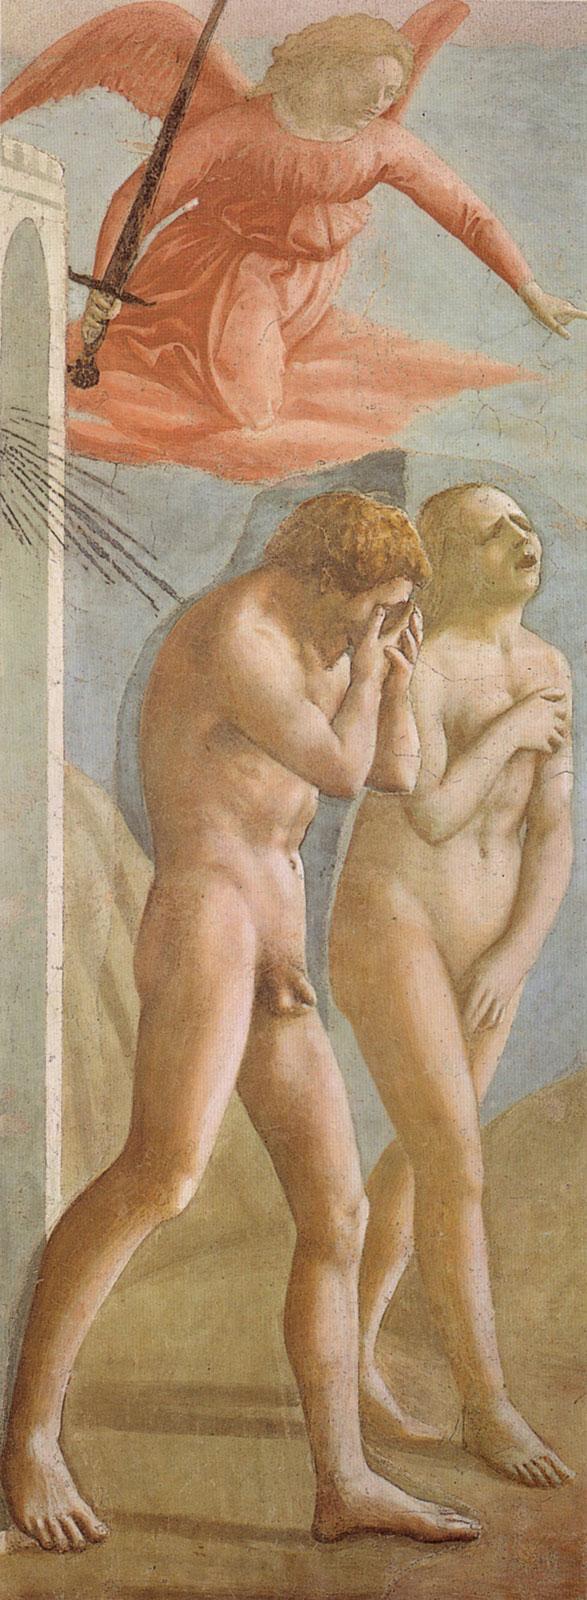 Expulsion of Adam and Eve from Eden by Masaccio